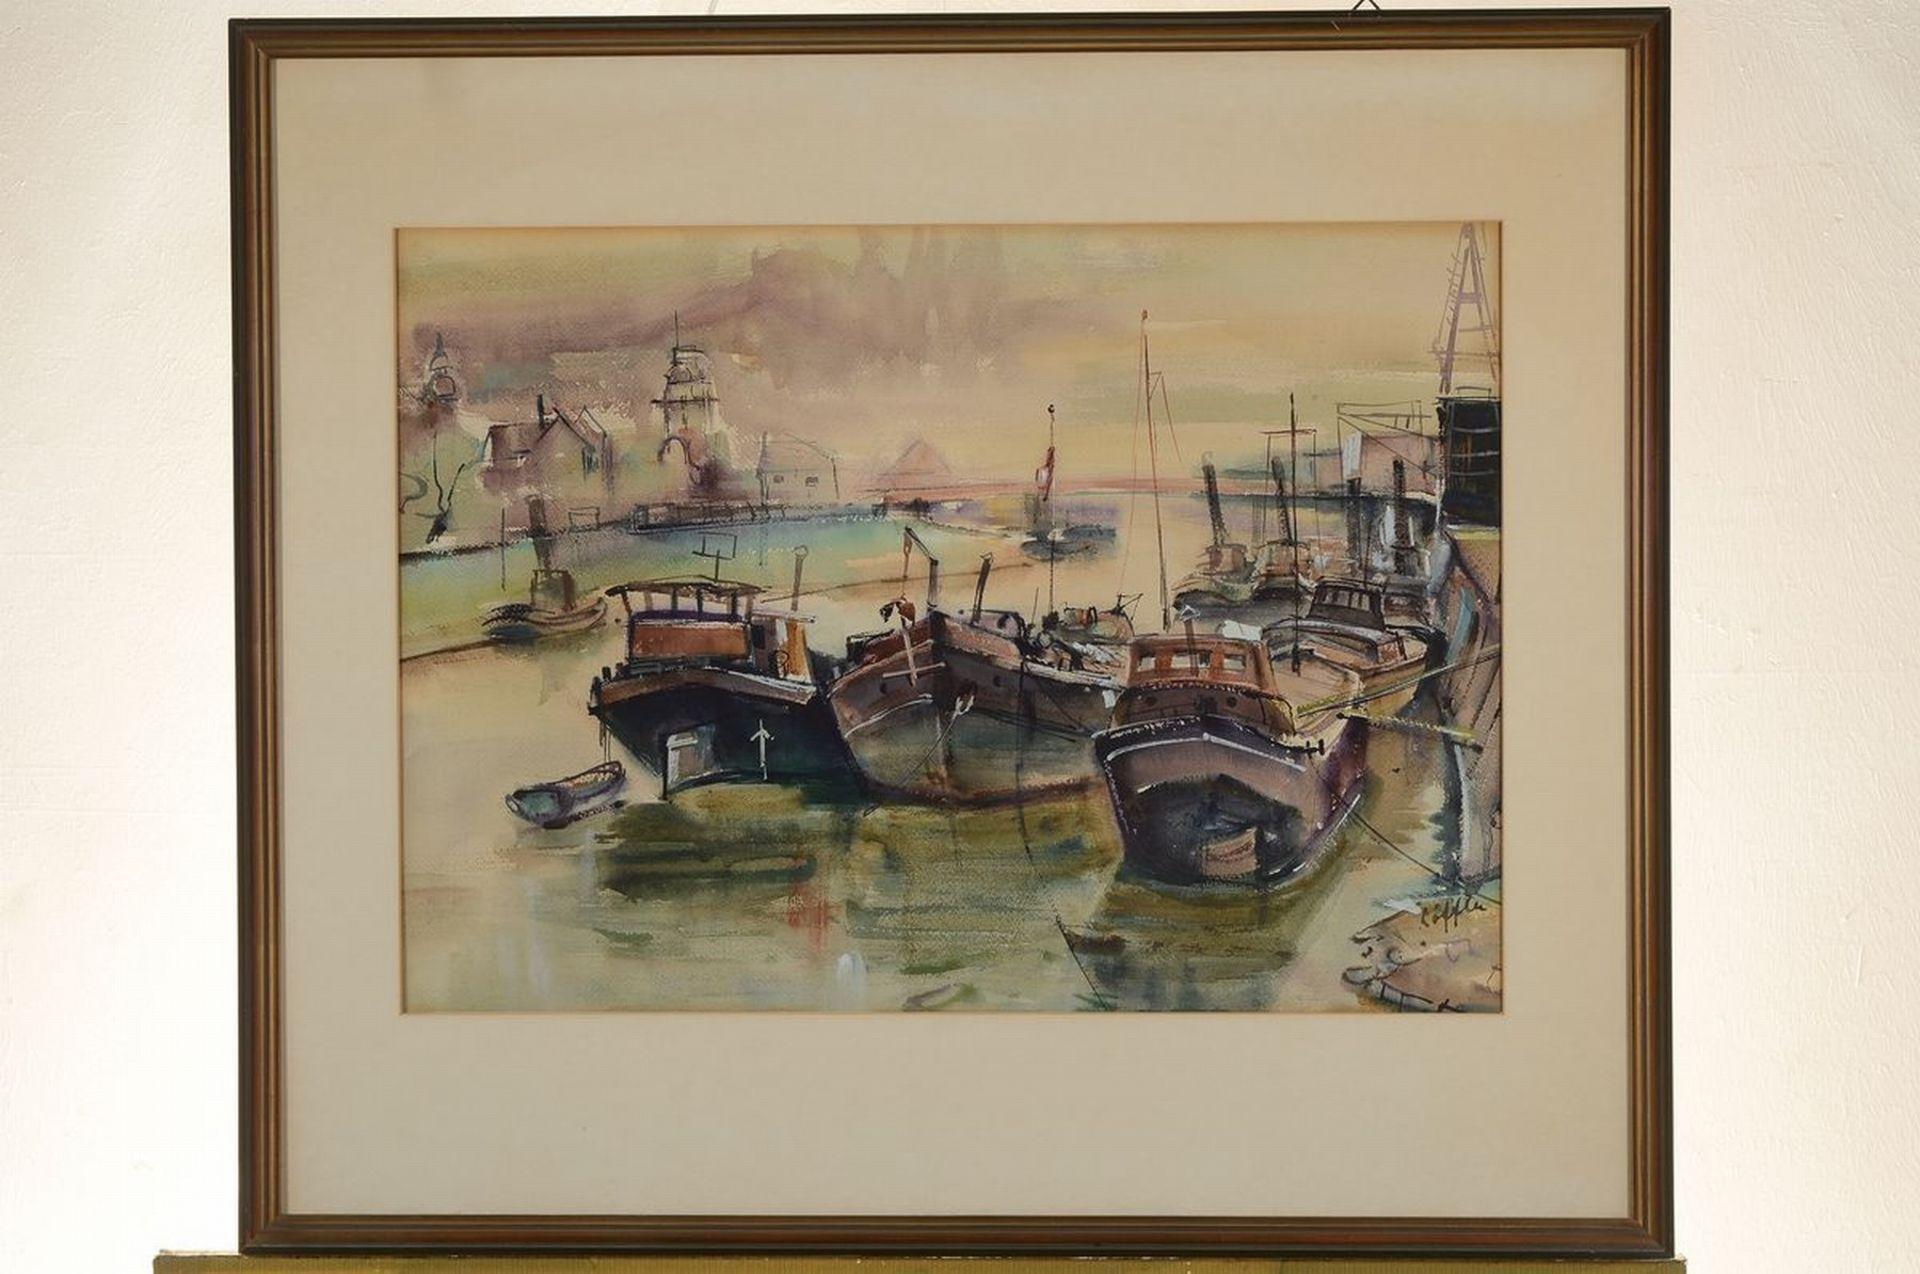 Paul Löffler, 1938-1995 Mannheim, Hafenansicht, Aquarell - Bild 3 aus 3